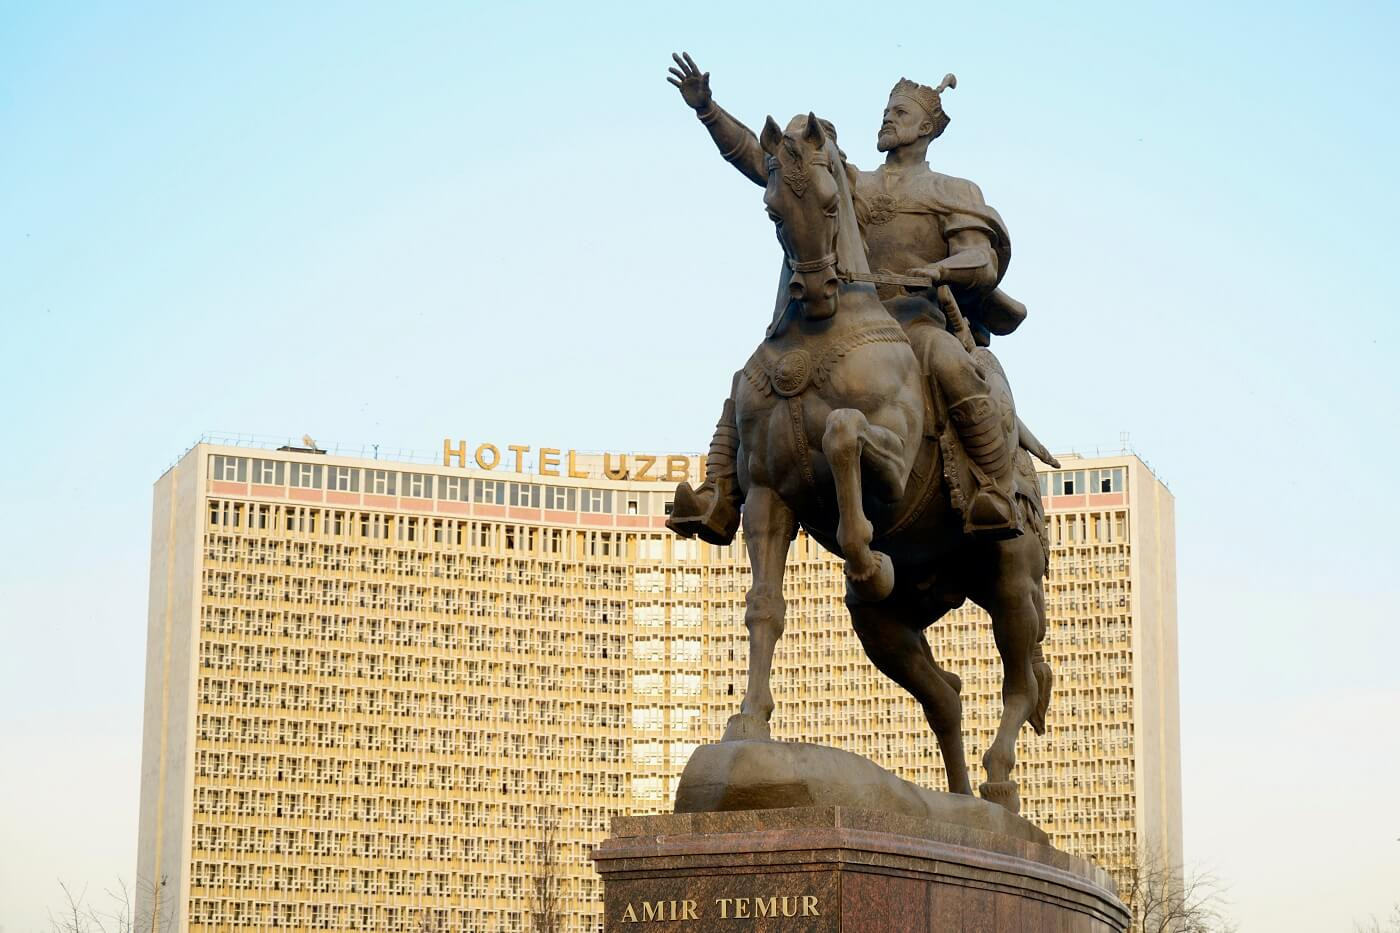 Amir Timur statue in Tashkent, Uzbekistan